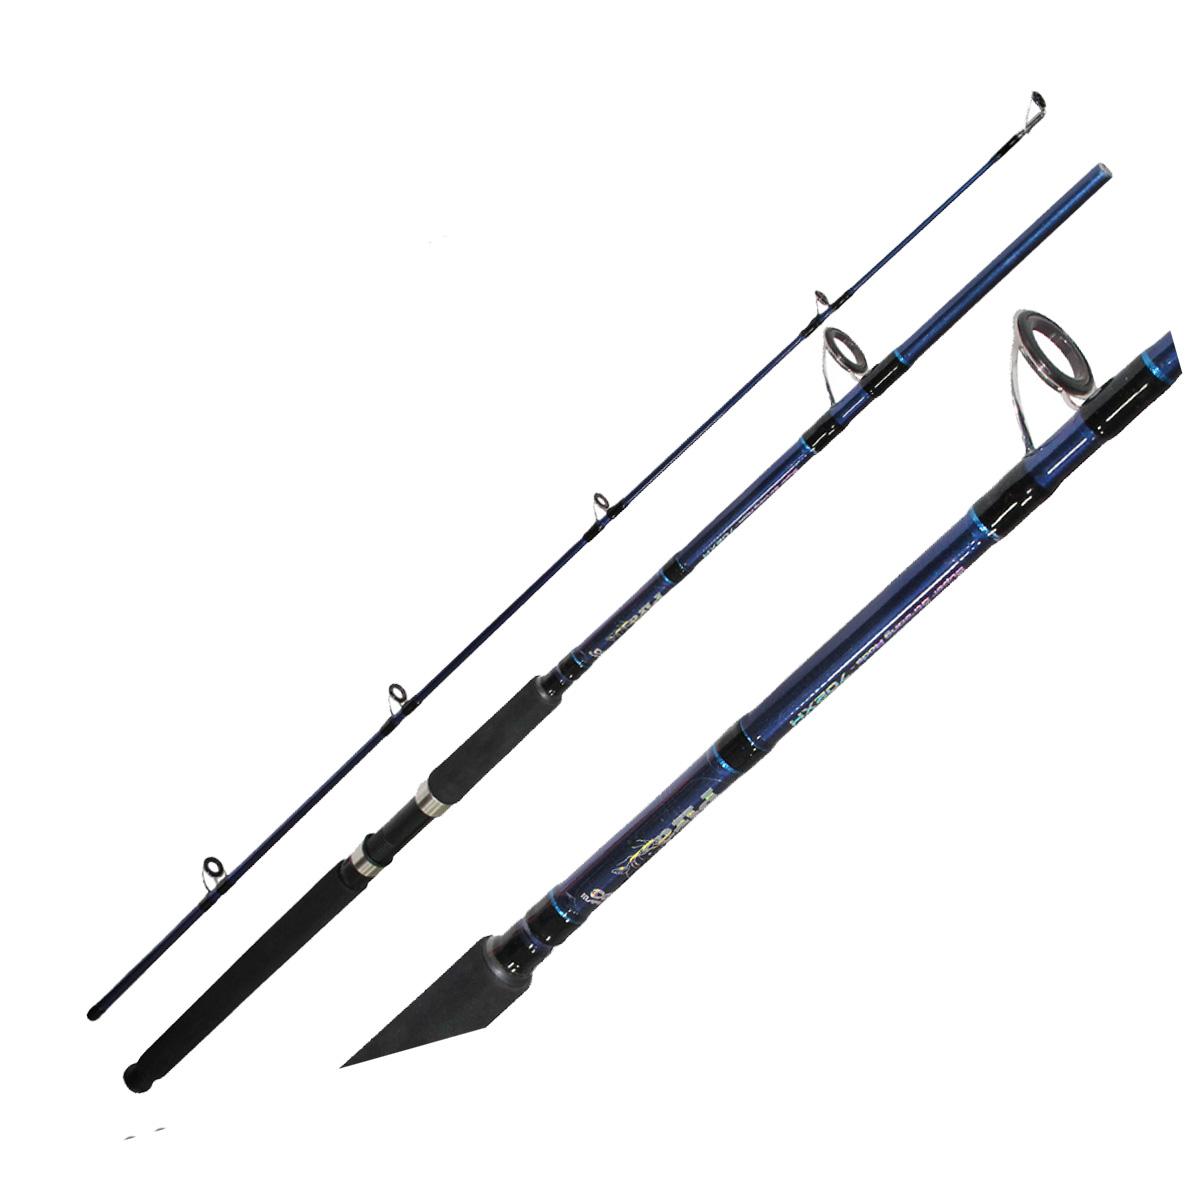 Vara Maruri Pira p/ Molinete 2,44 m 80 lbs (2 partes)  - Pró Pesca Shop